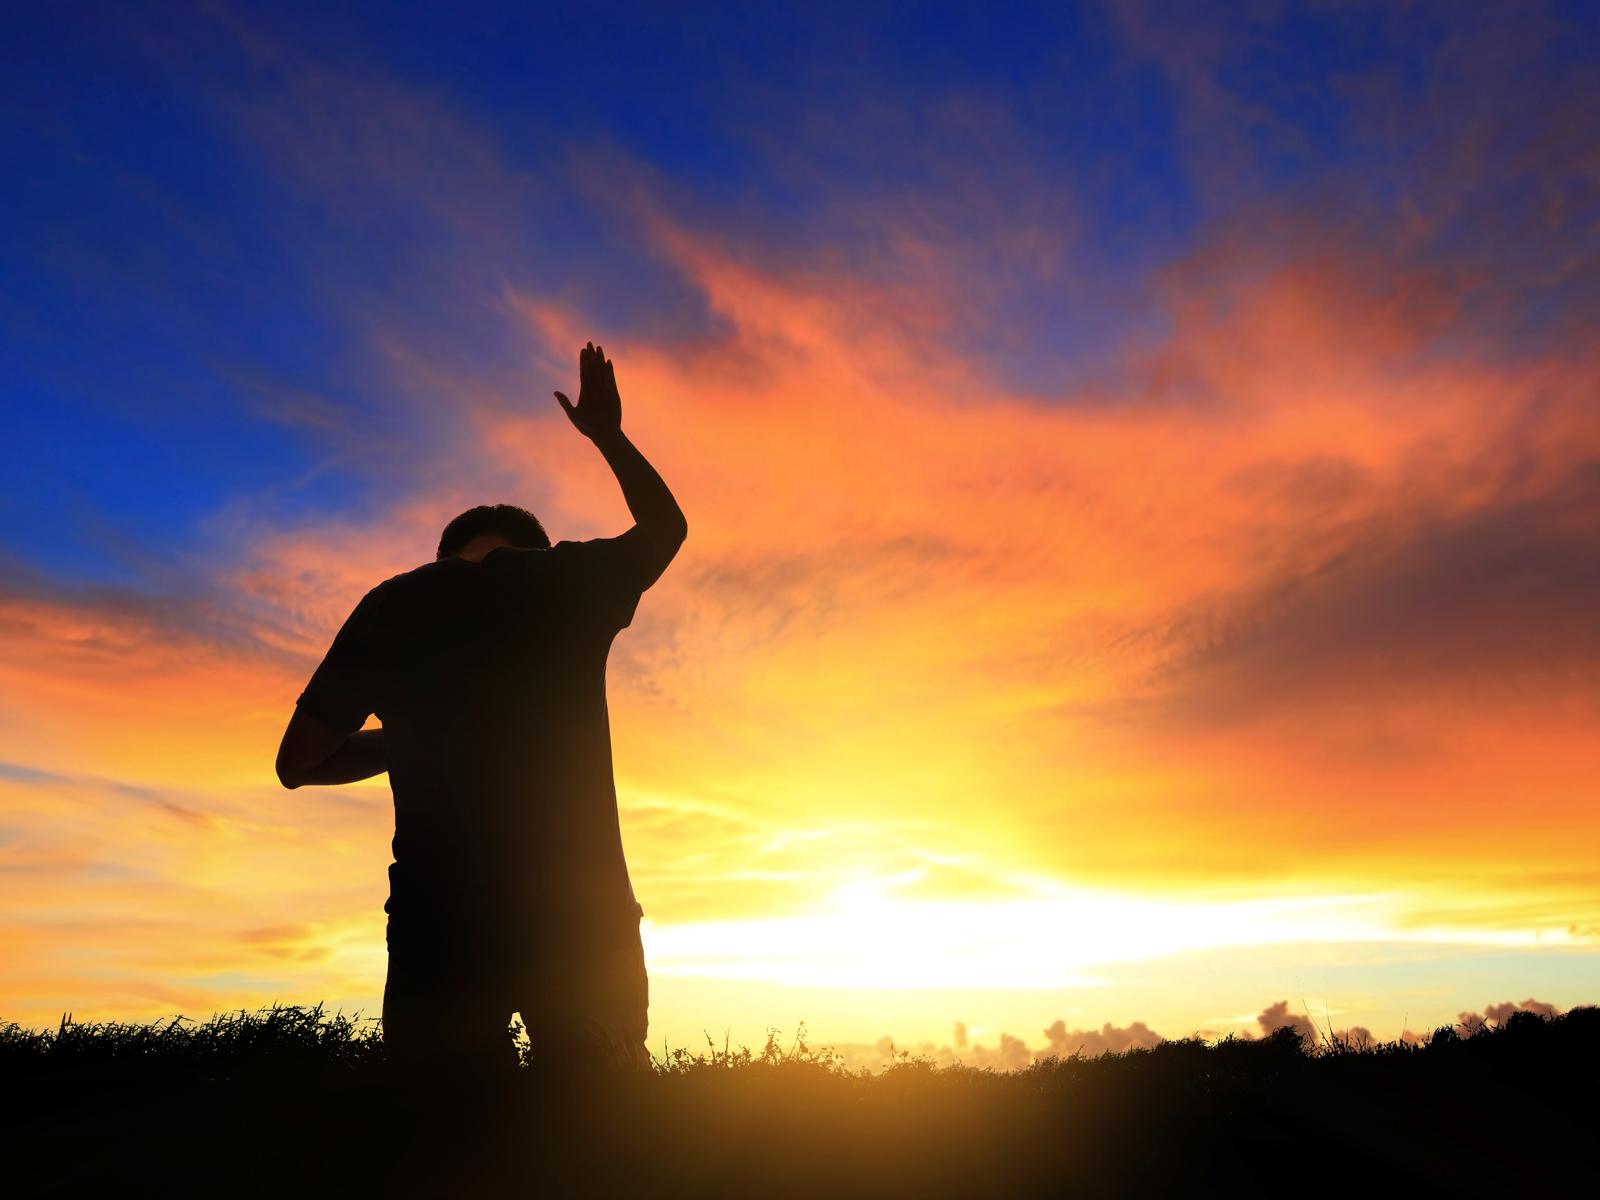 A fé é o ato mais nobre do homem e é um dom gratuito